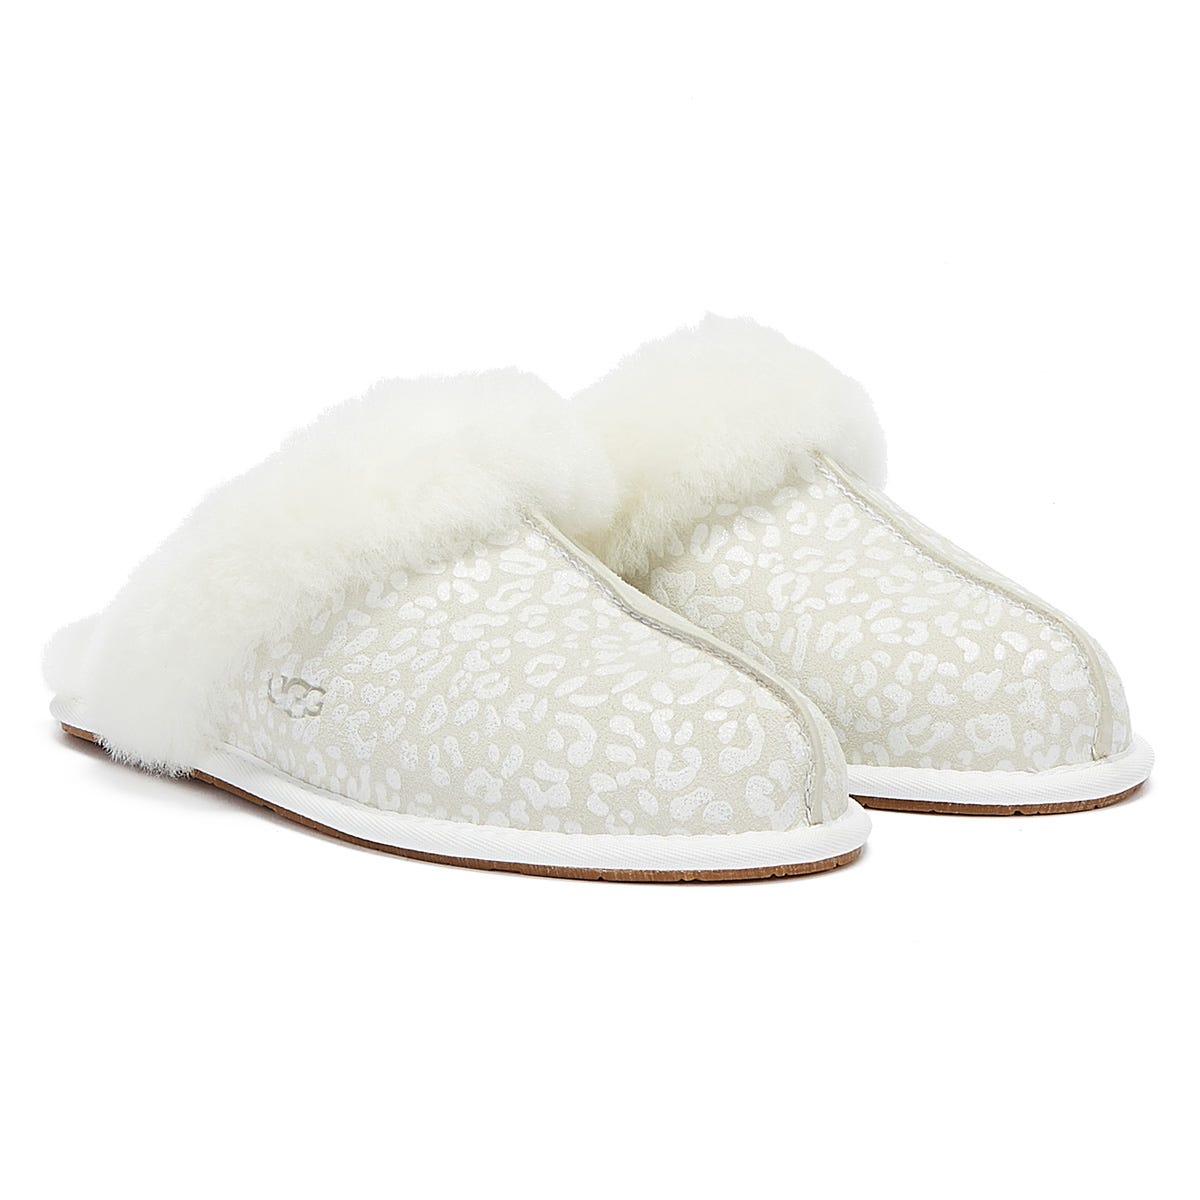 UGG Scuffette II Snow Leopard Womens White Slippers UK 3